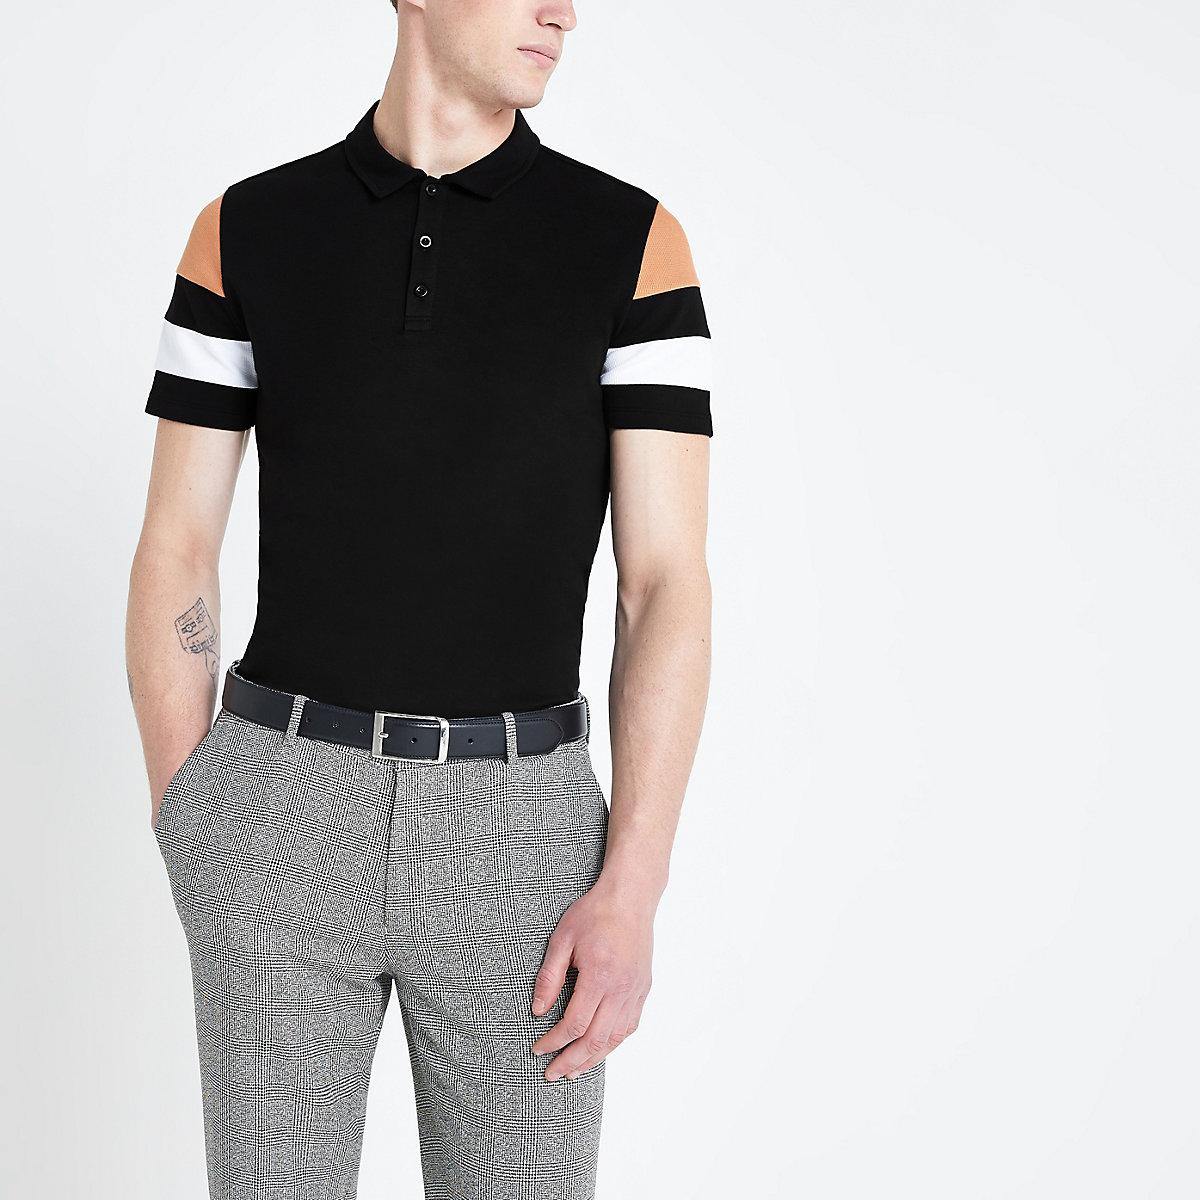 Black slim fit color block sleeve polo shirt